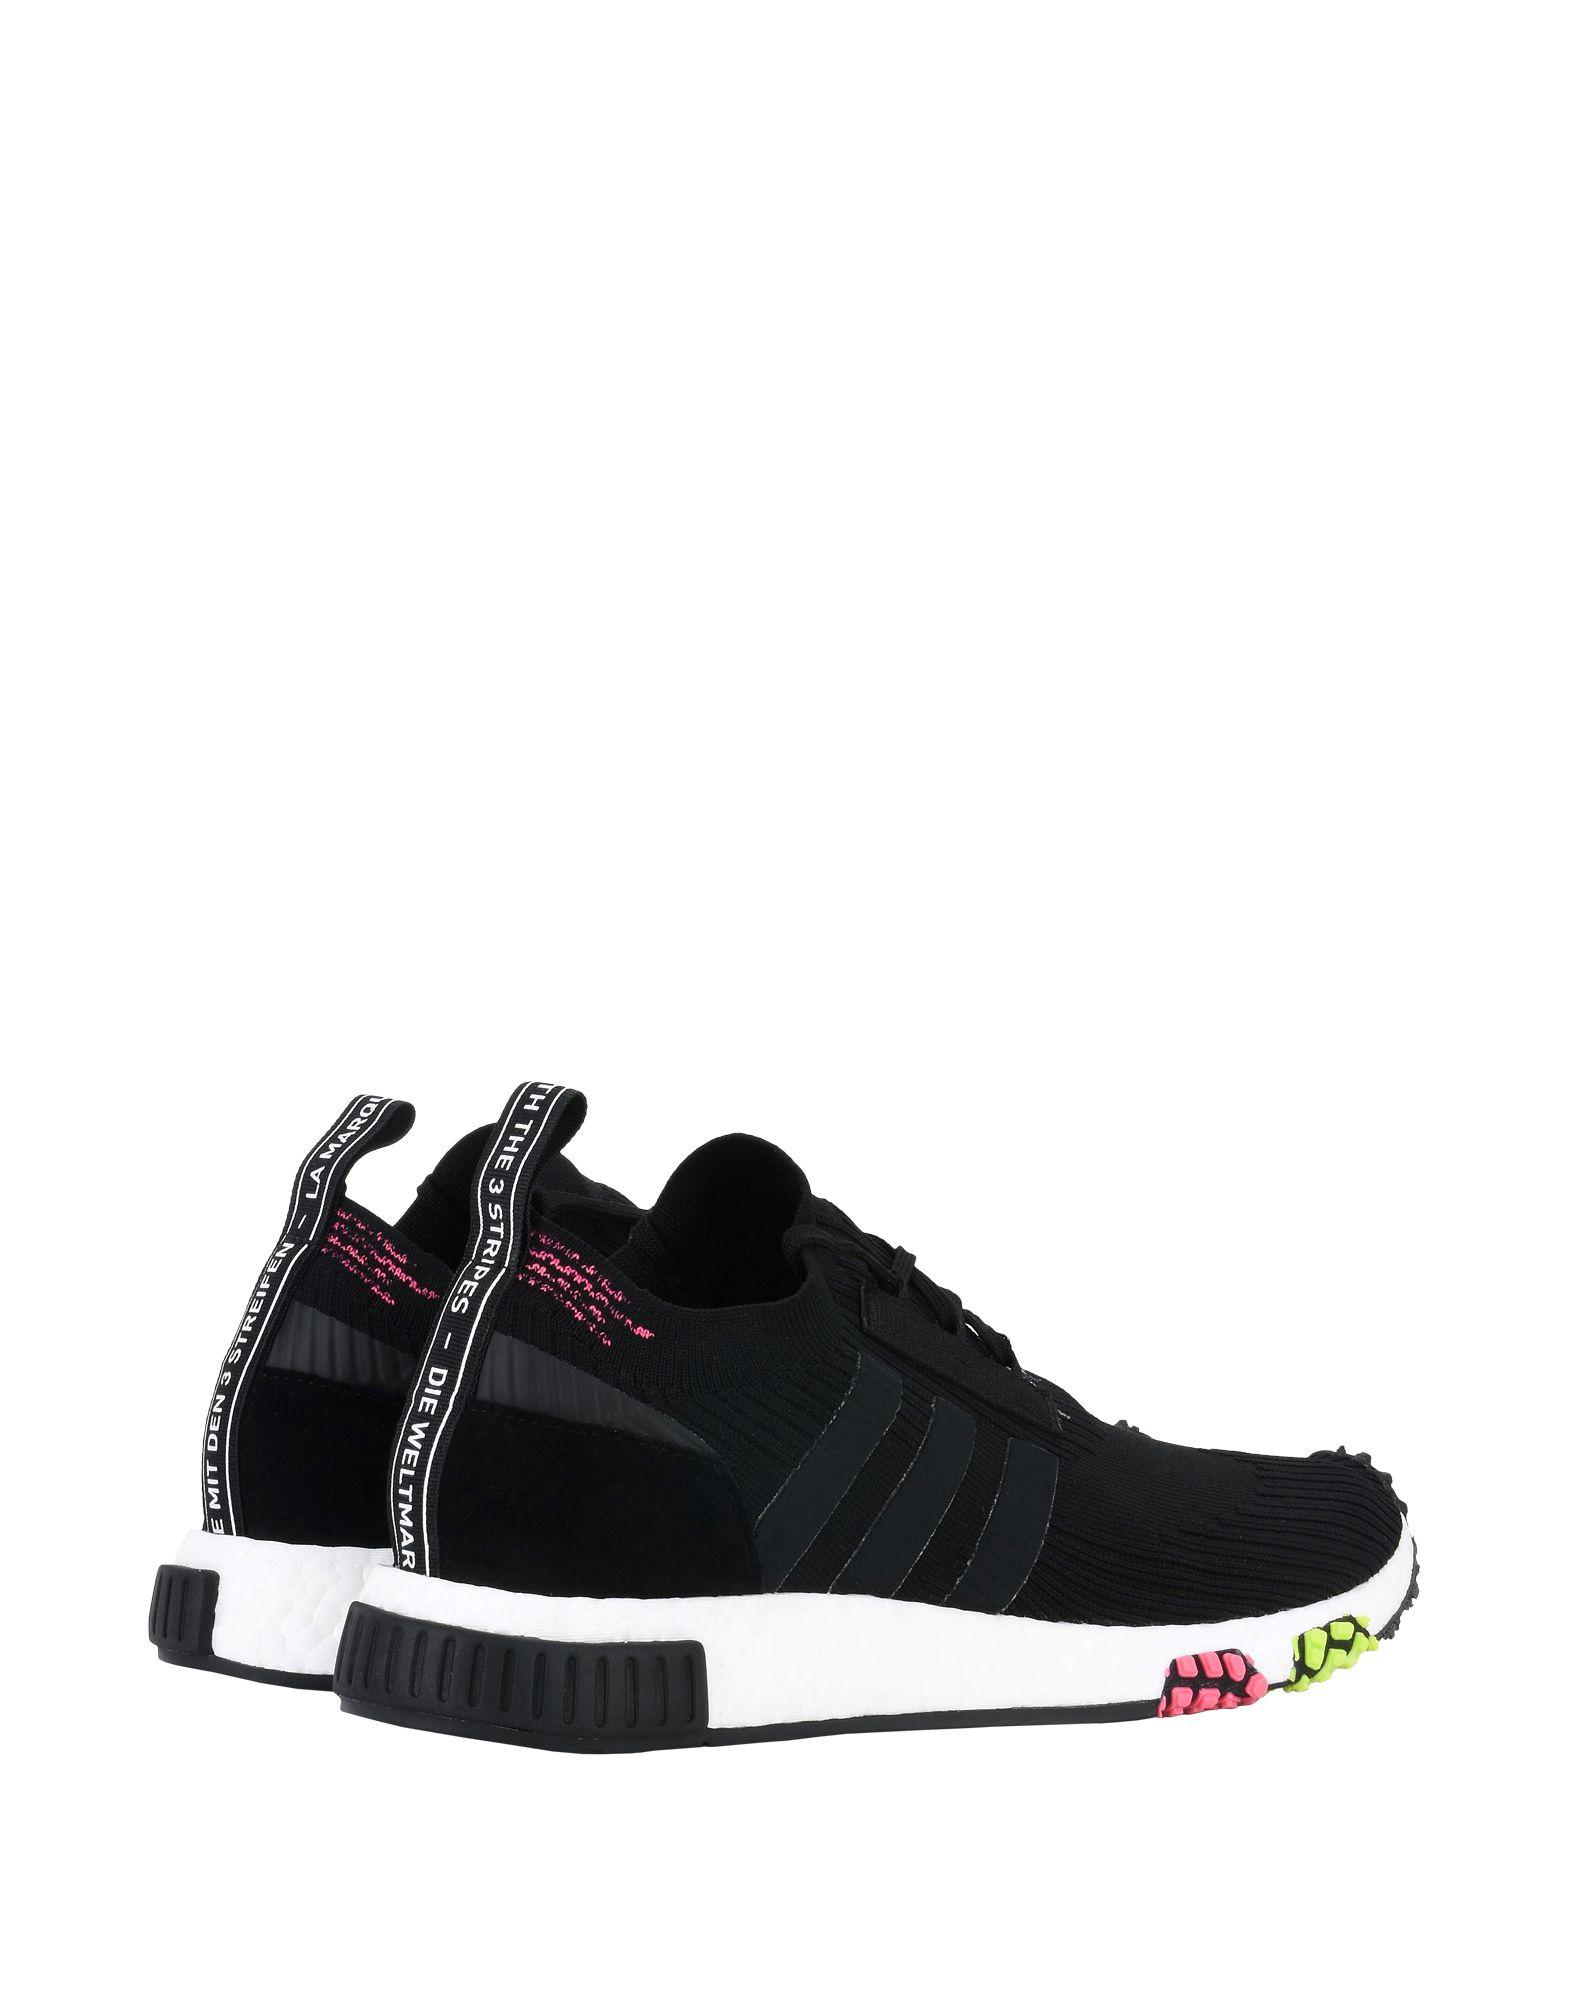 ... Sneakers Adidas Originals Nmd_Racer Pk - Femme - Sneakers Adidas  Originals sur ...